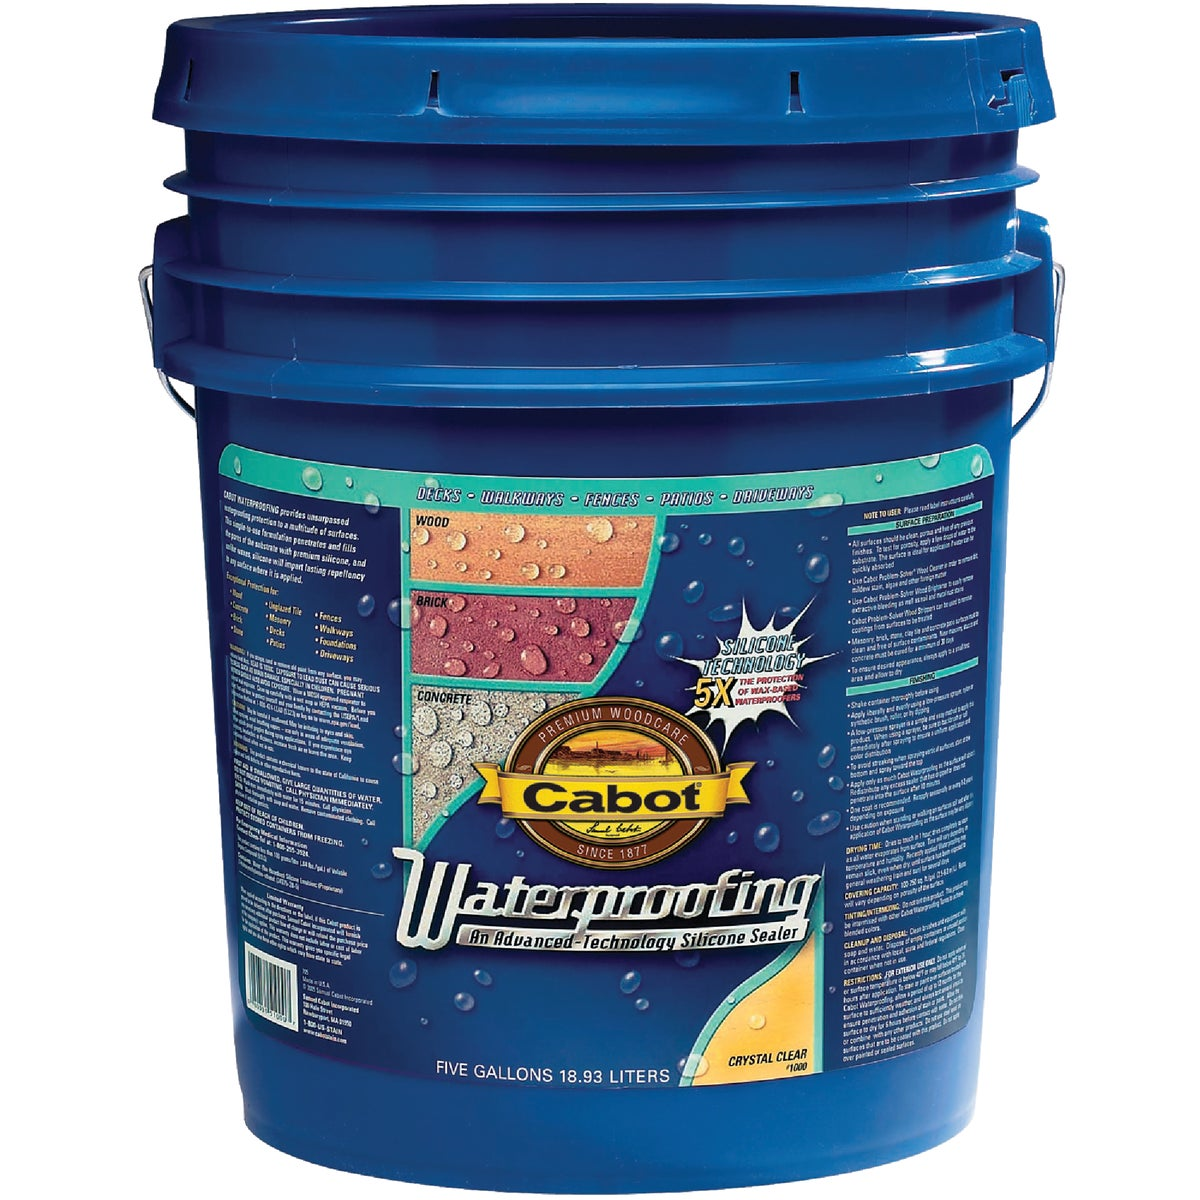 CLEAR WATERPROOFING